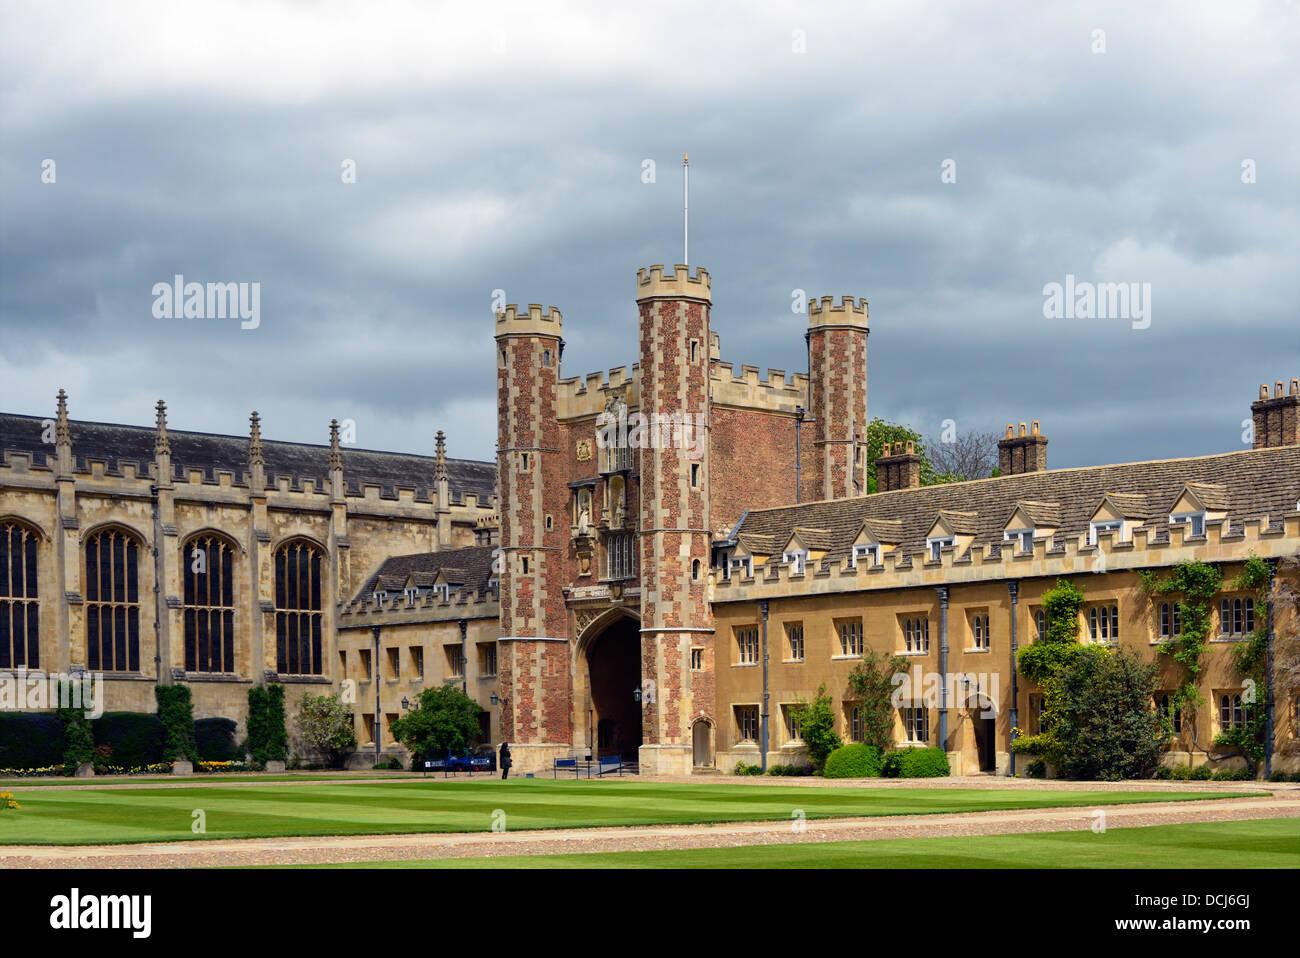 the-chapel-and-great-gate-trinity-college-university-of-cambridge-DCJ6GJ.jpg